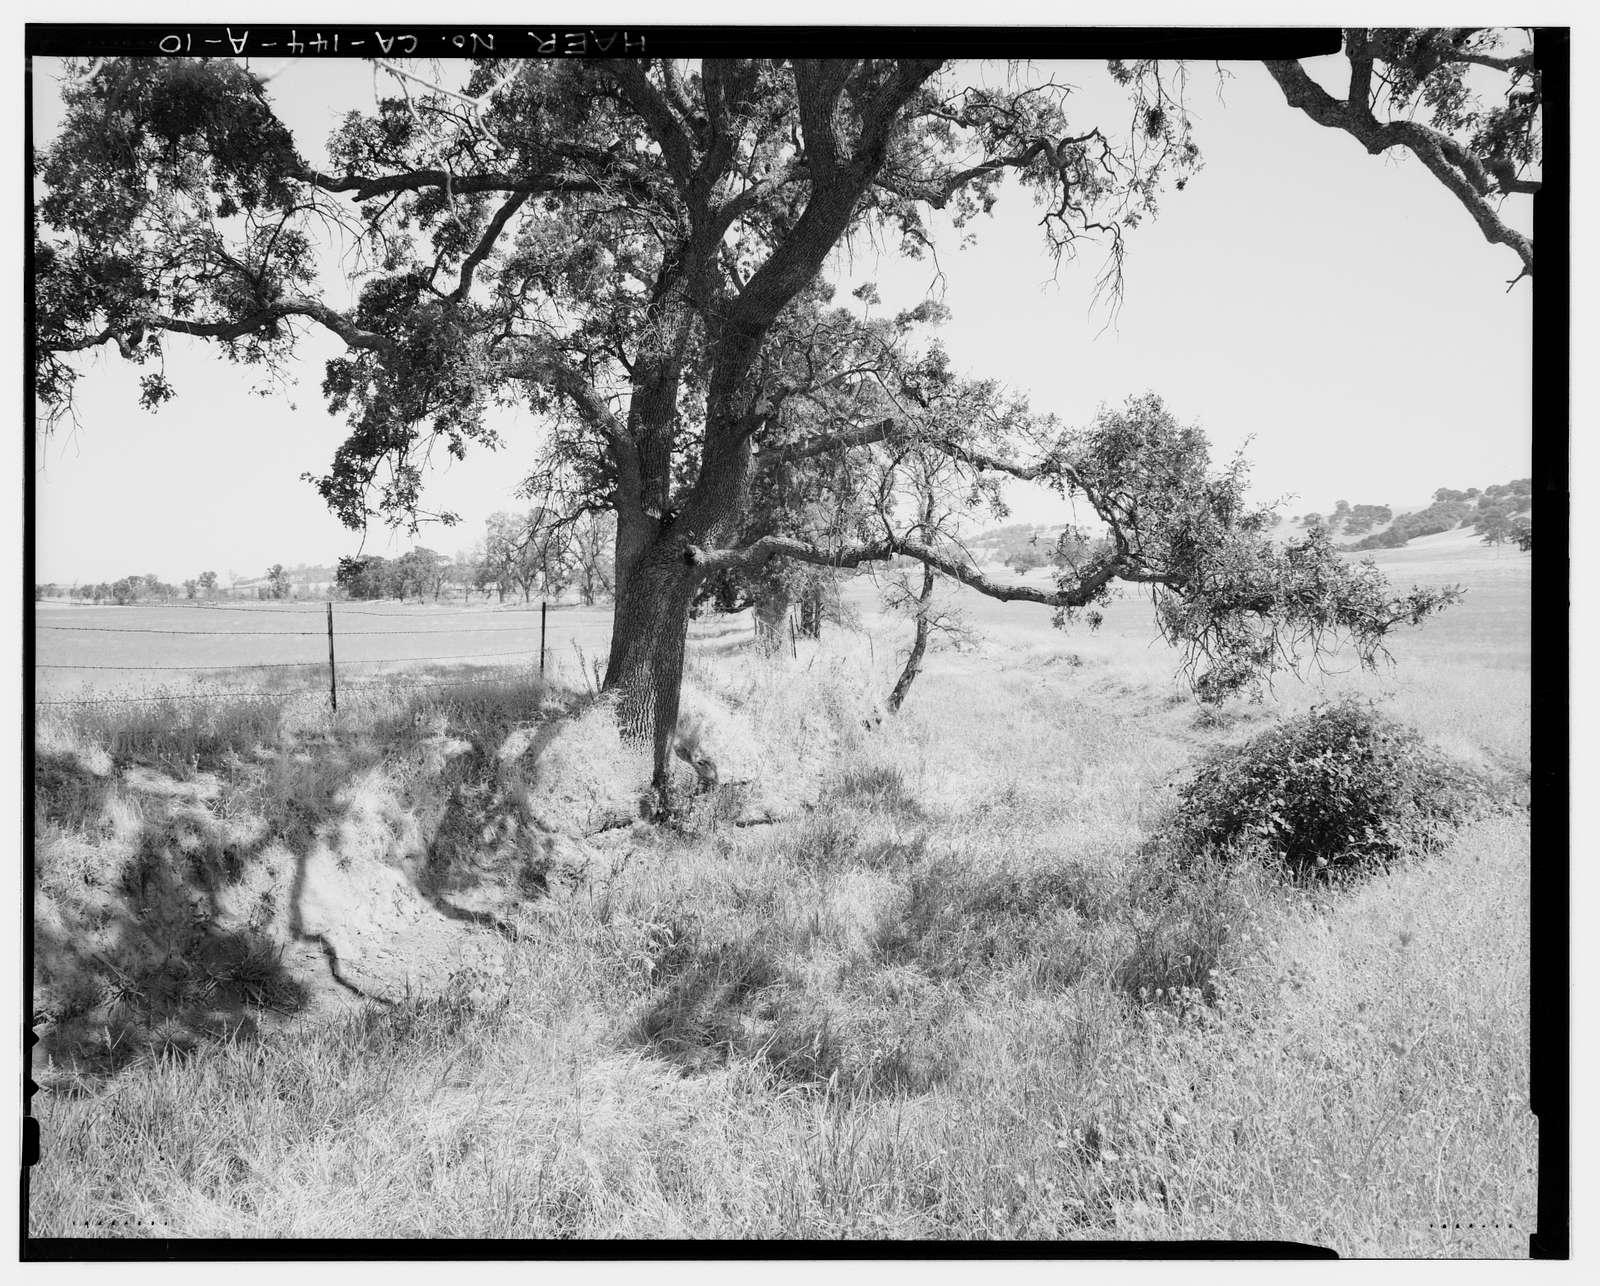 Natomas Ditch System, Blue Ravine Segment, Juncture of Blue Ravine & Green Valley Roads, Folsom, Sacramento County, CA